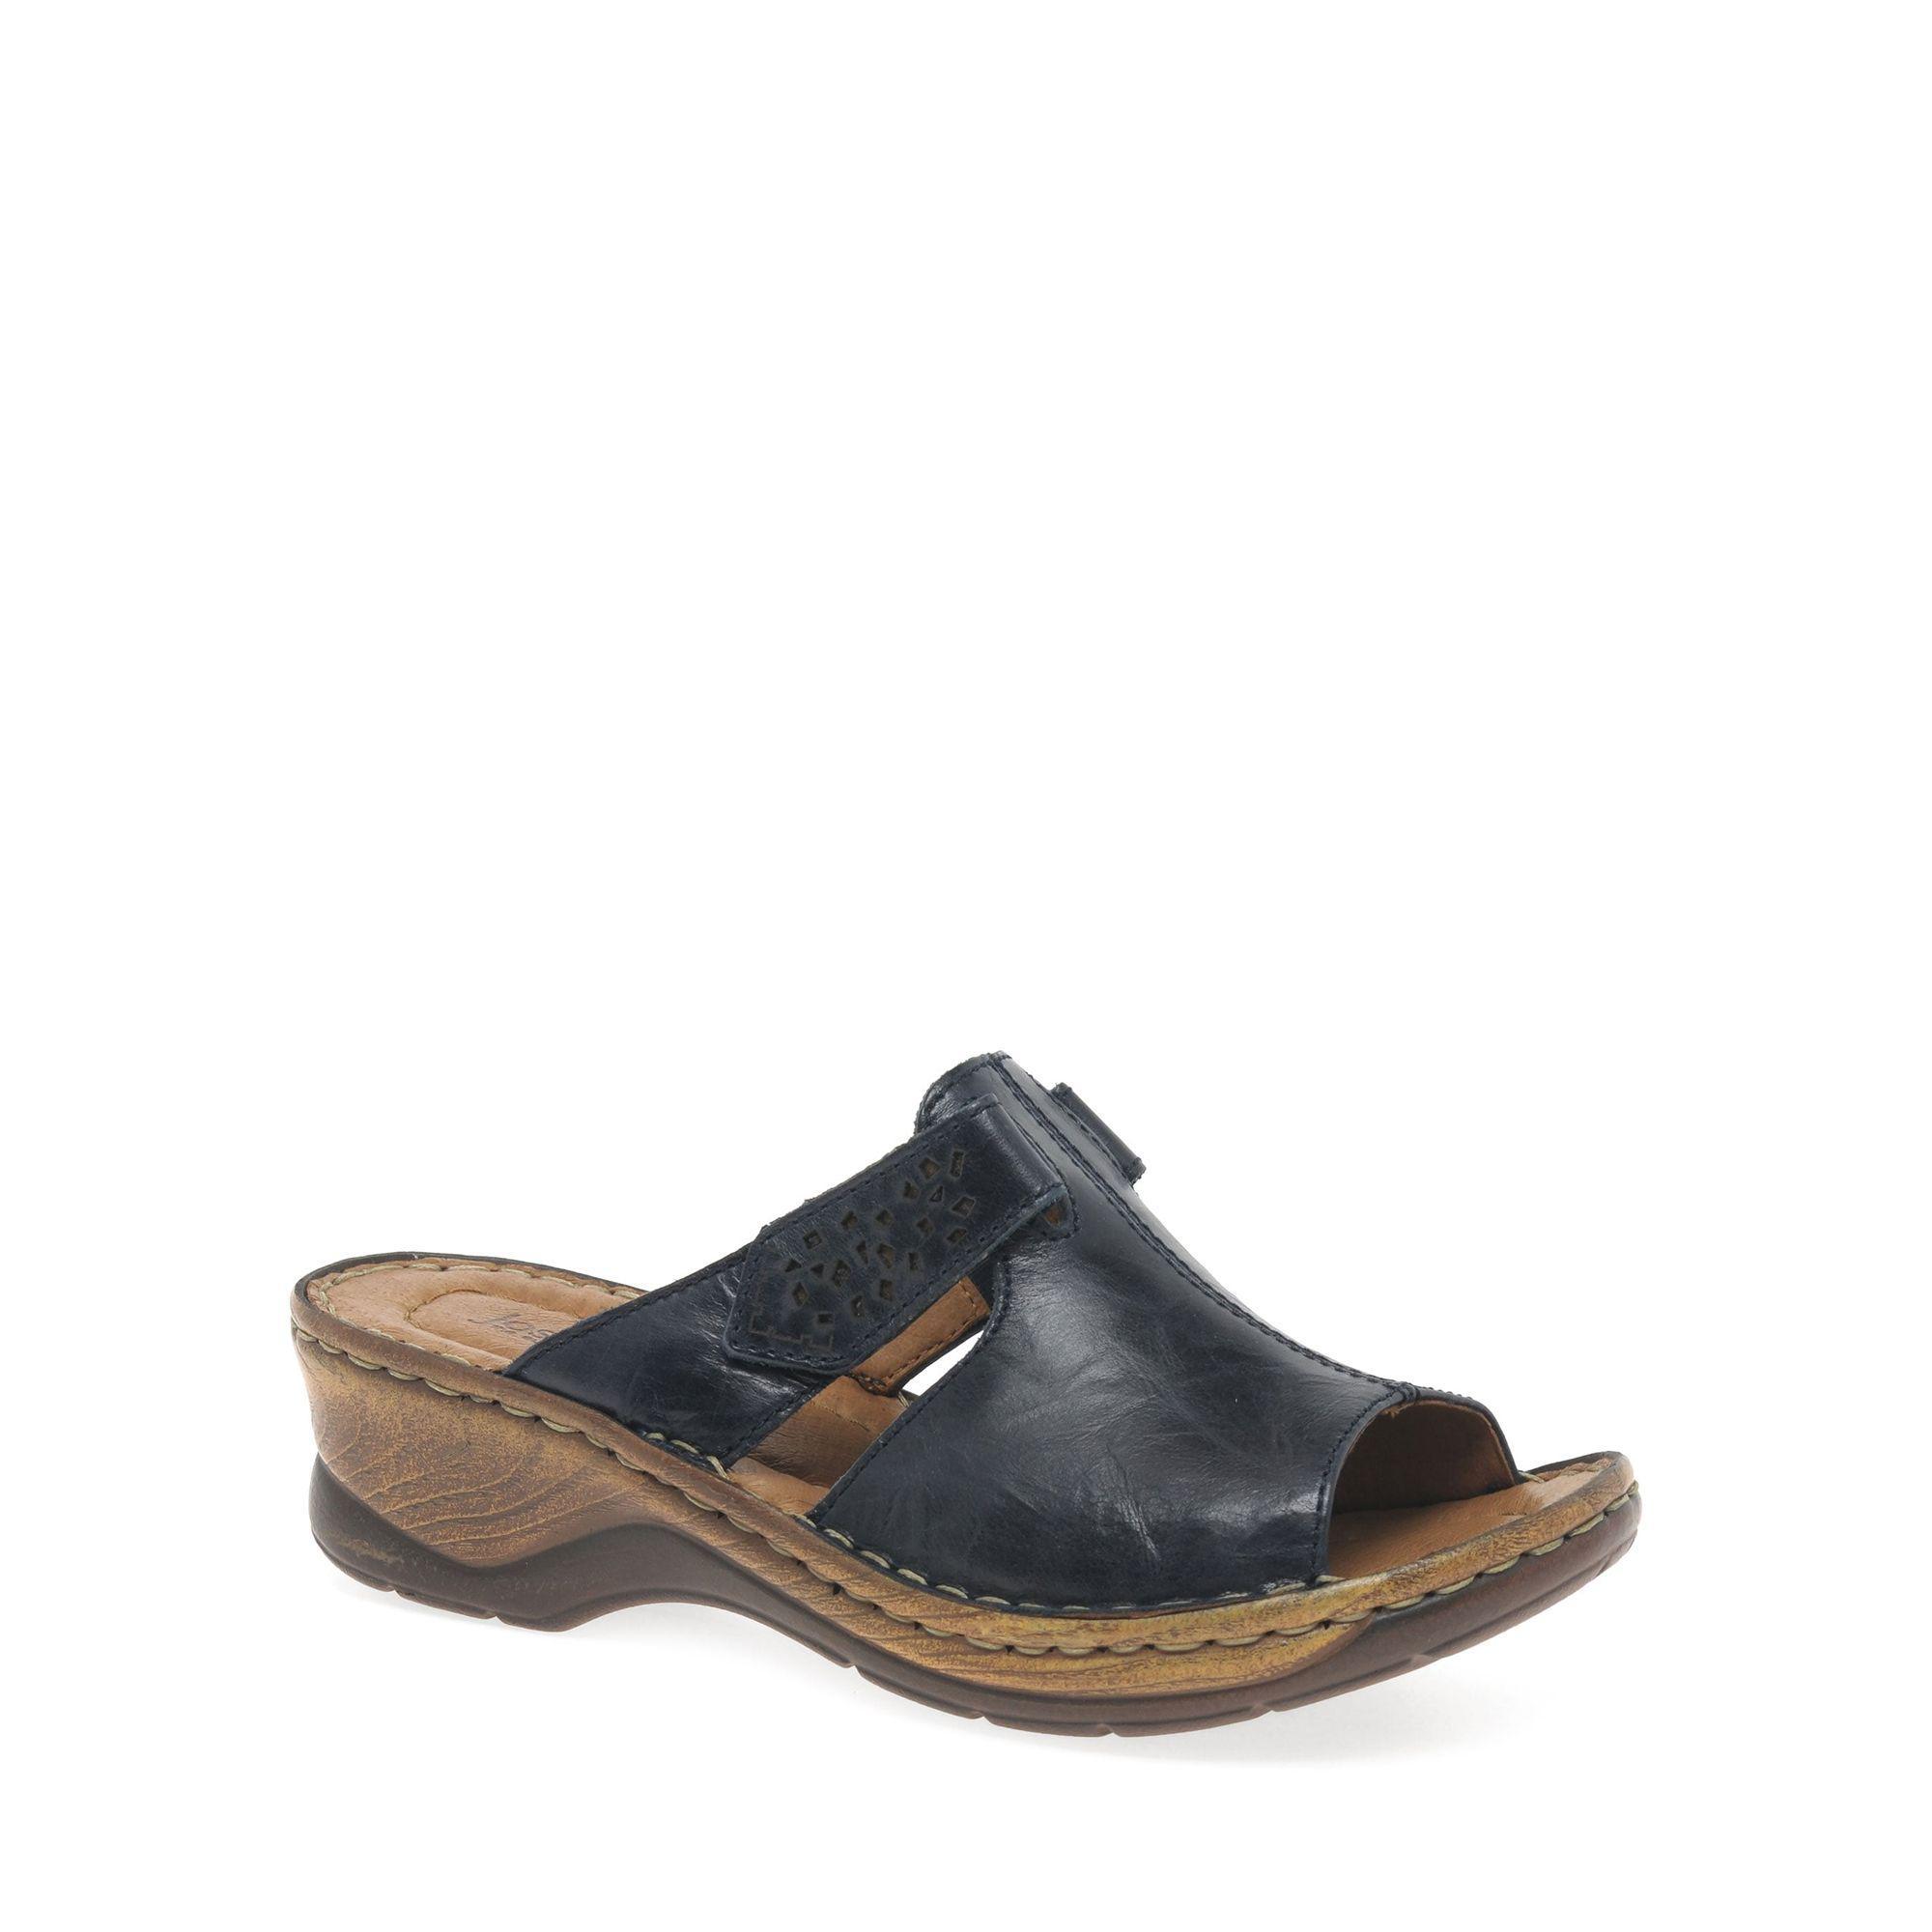 Navy 'Catalonia' womens velcro fastening sandals release dates choice sale online qzywMj